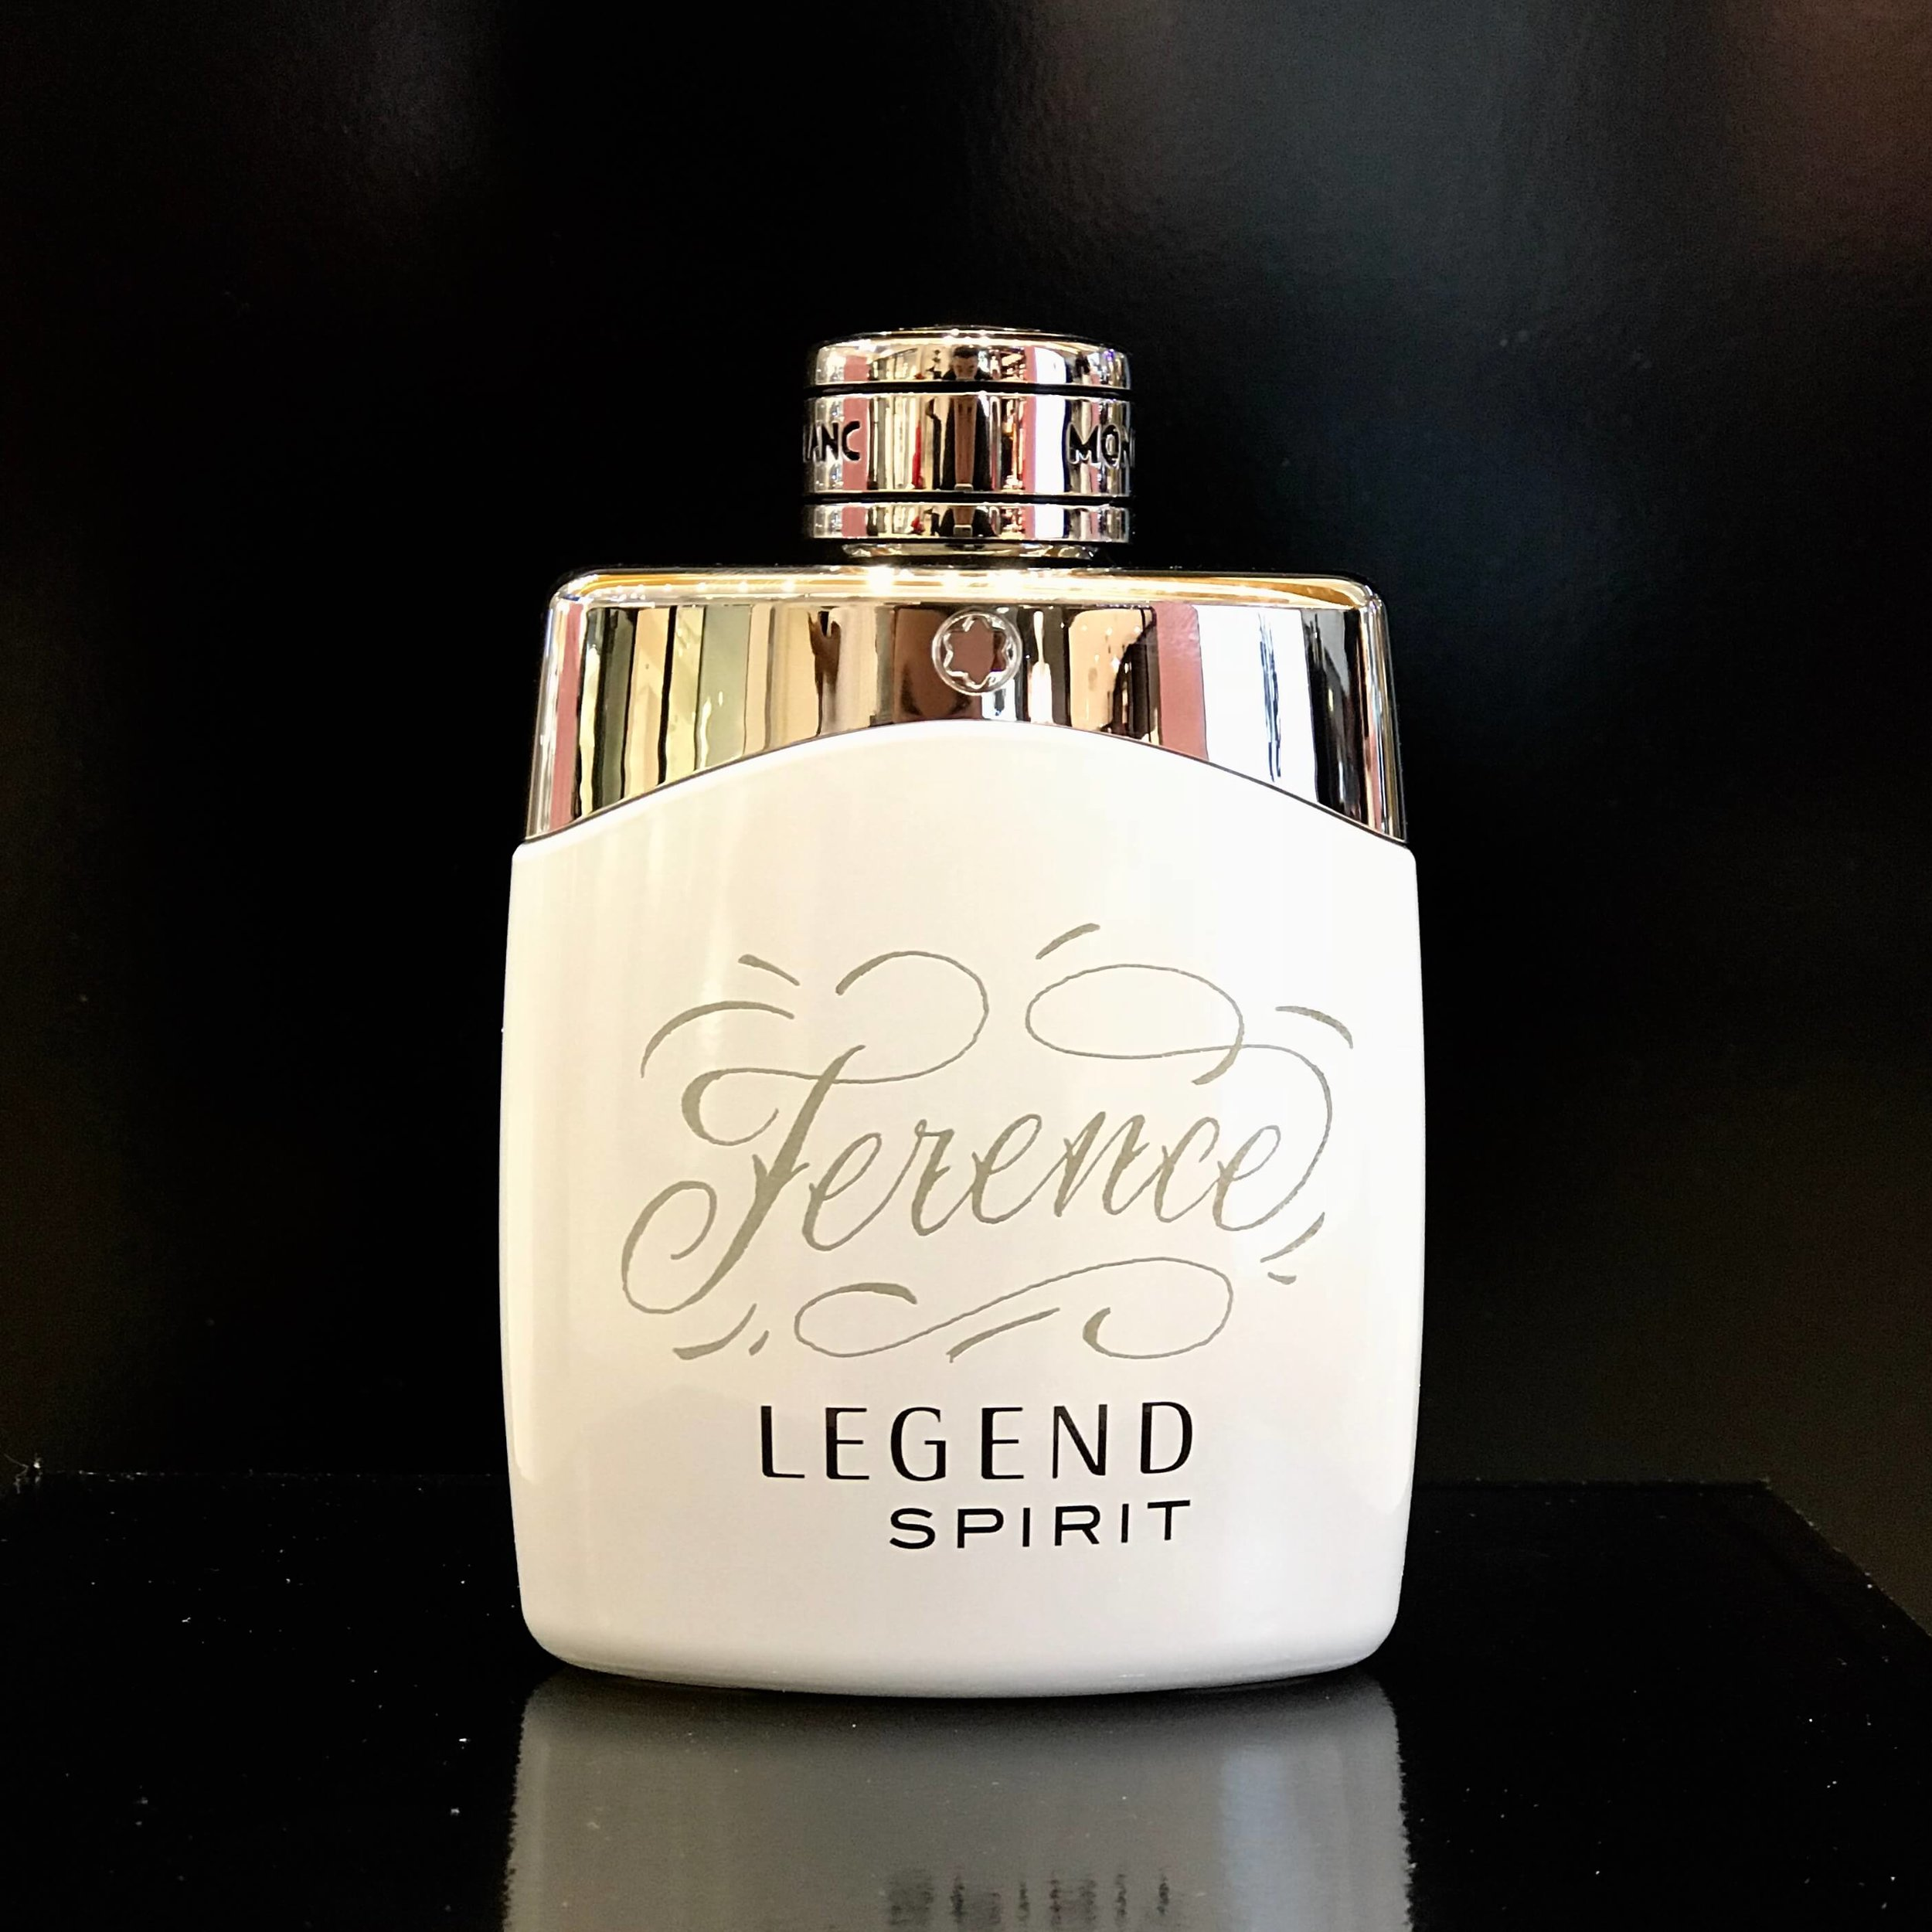 Perfume engraving